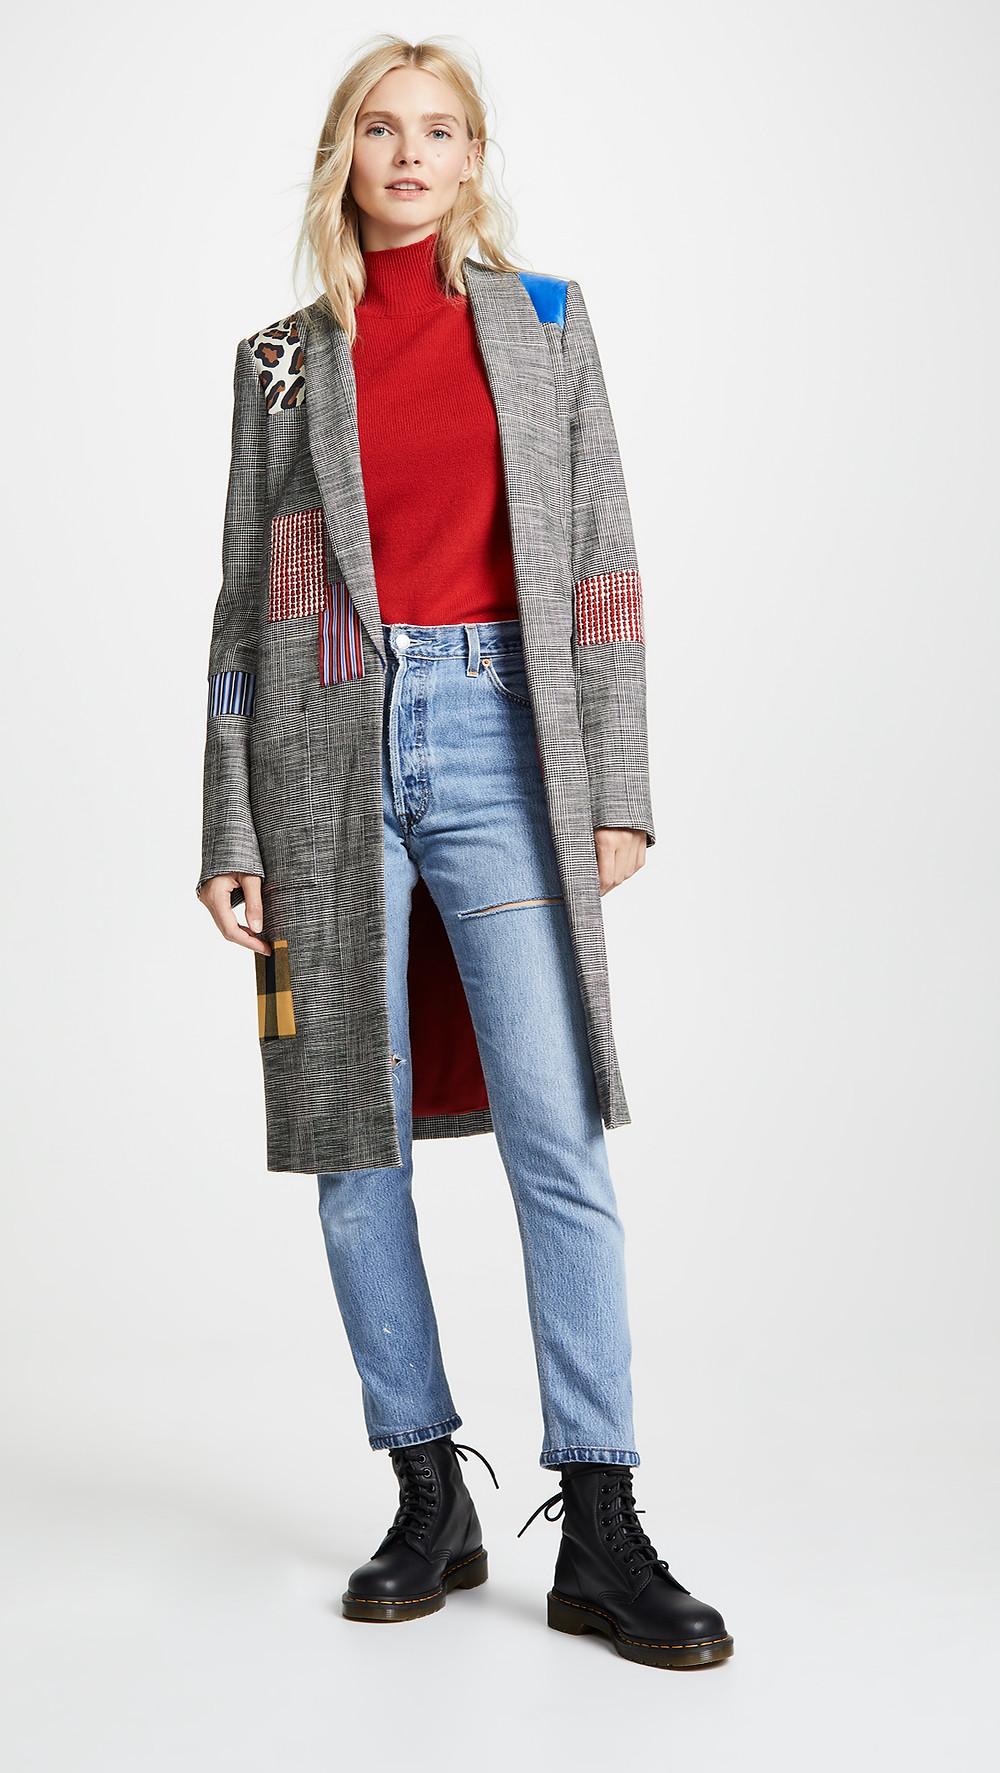 alice + olivia Kylie Patchwork Jacket $595